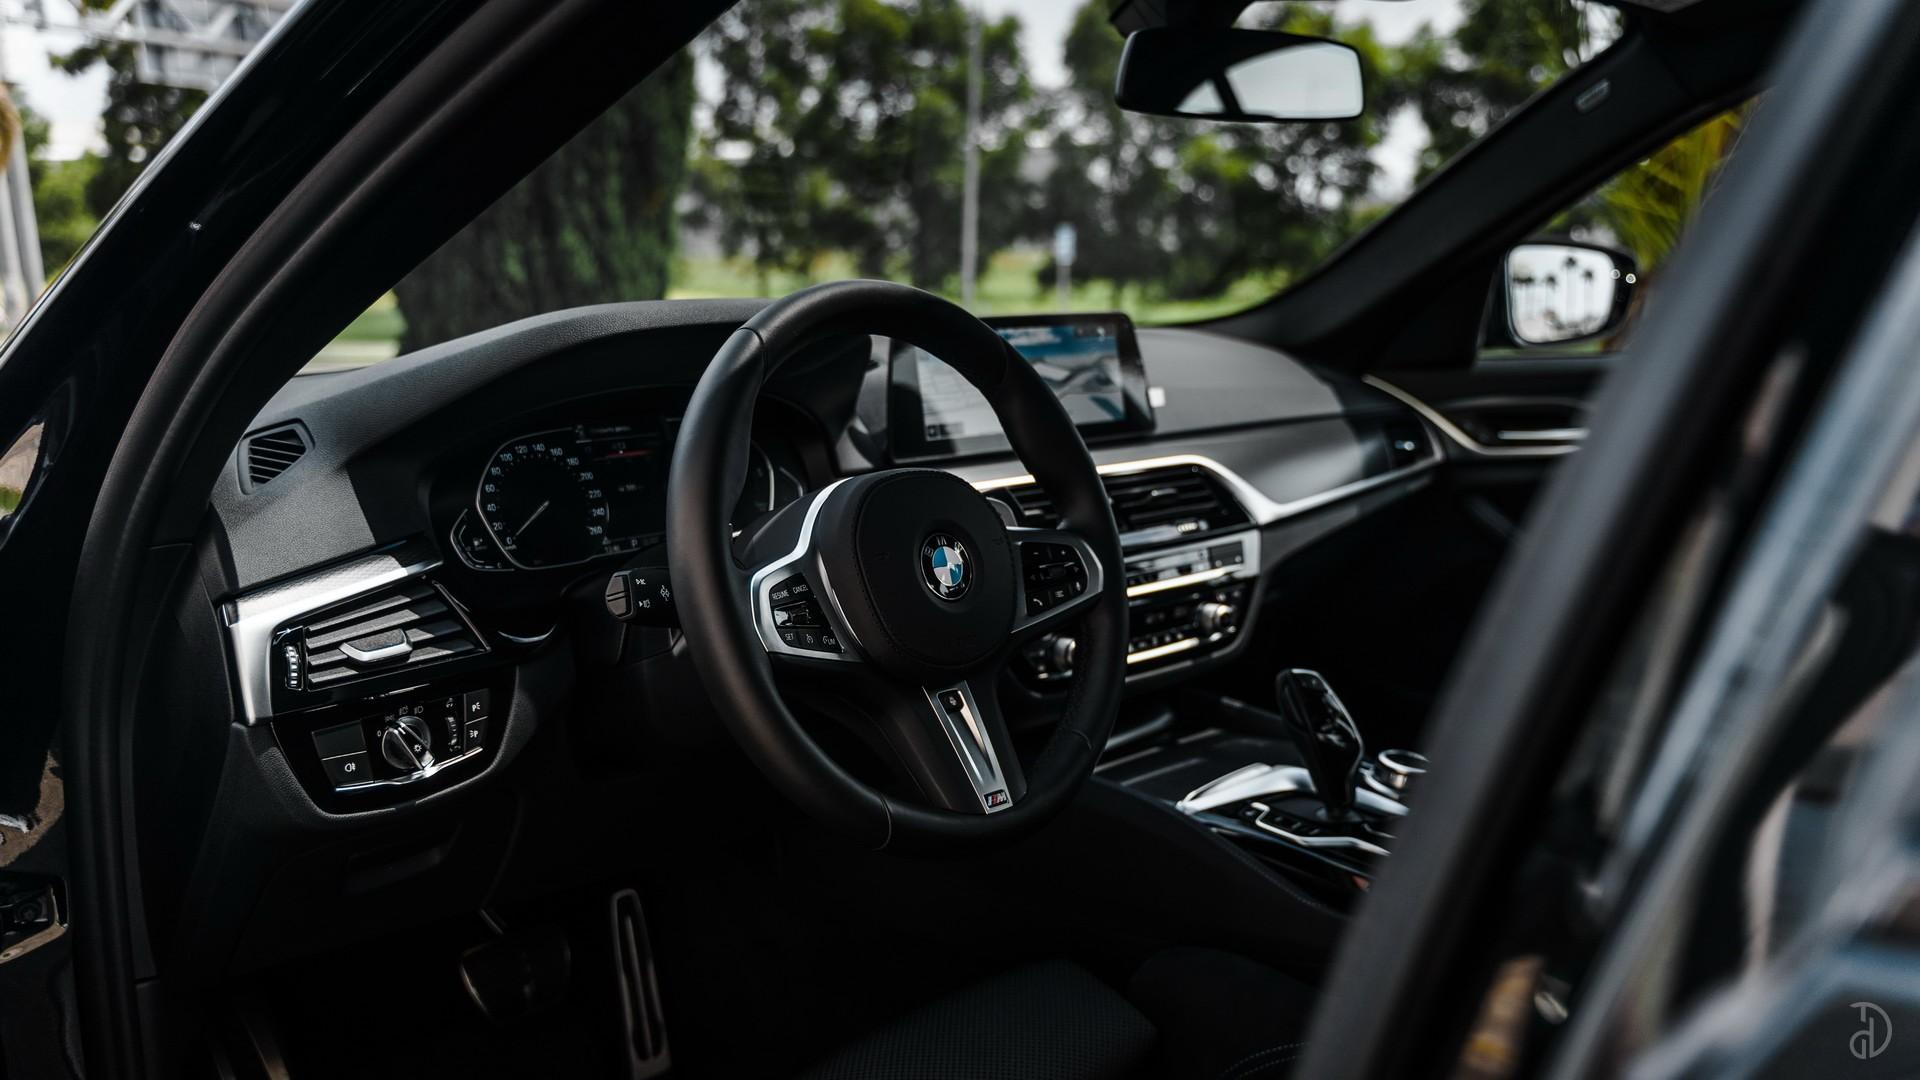 Аренда BMW 520d G30 в Сочи. Фото 12